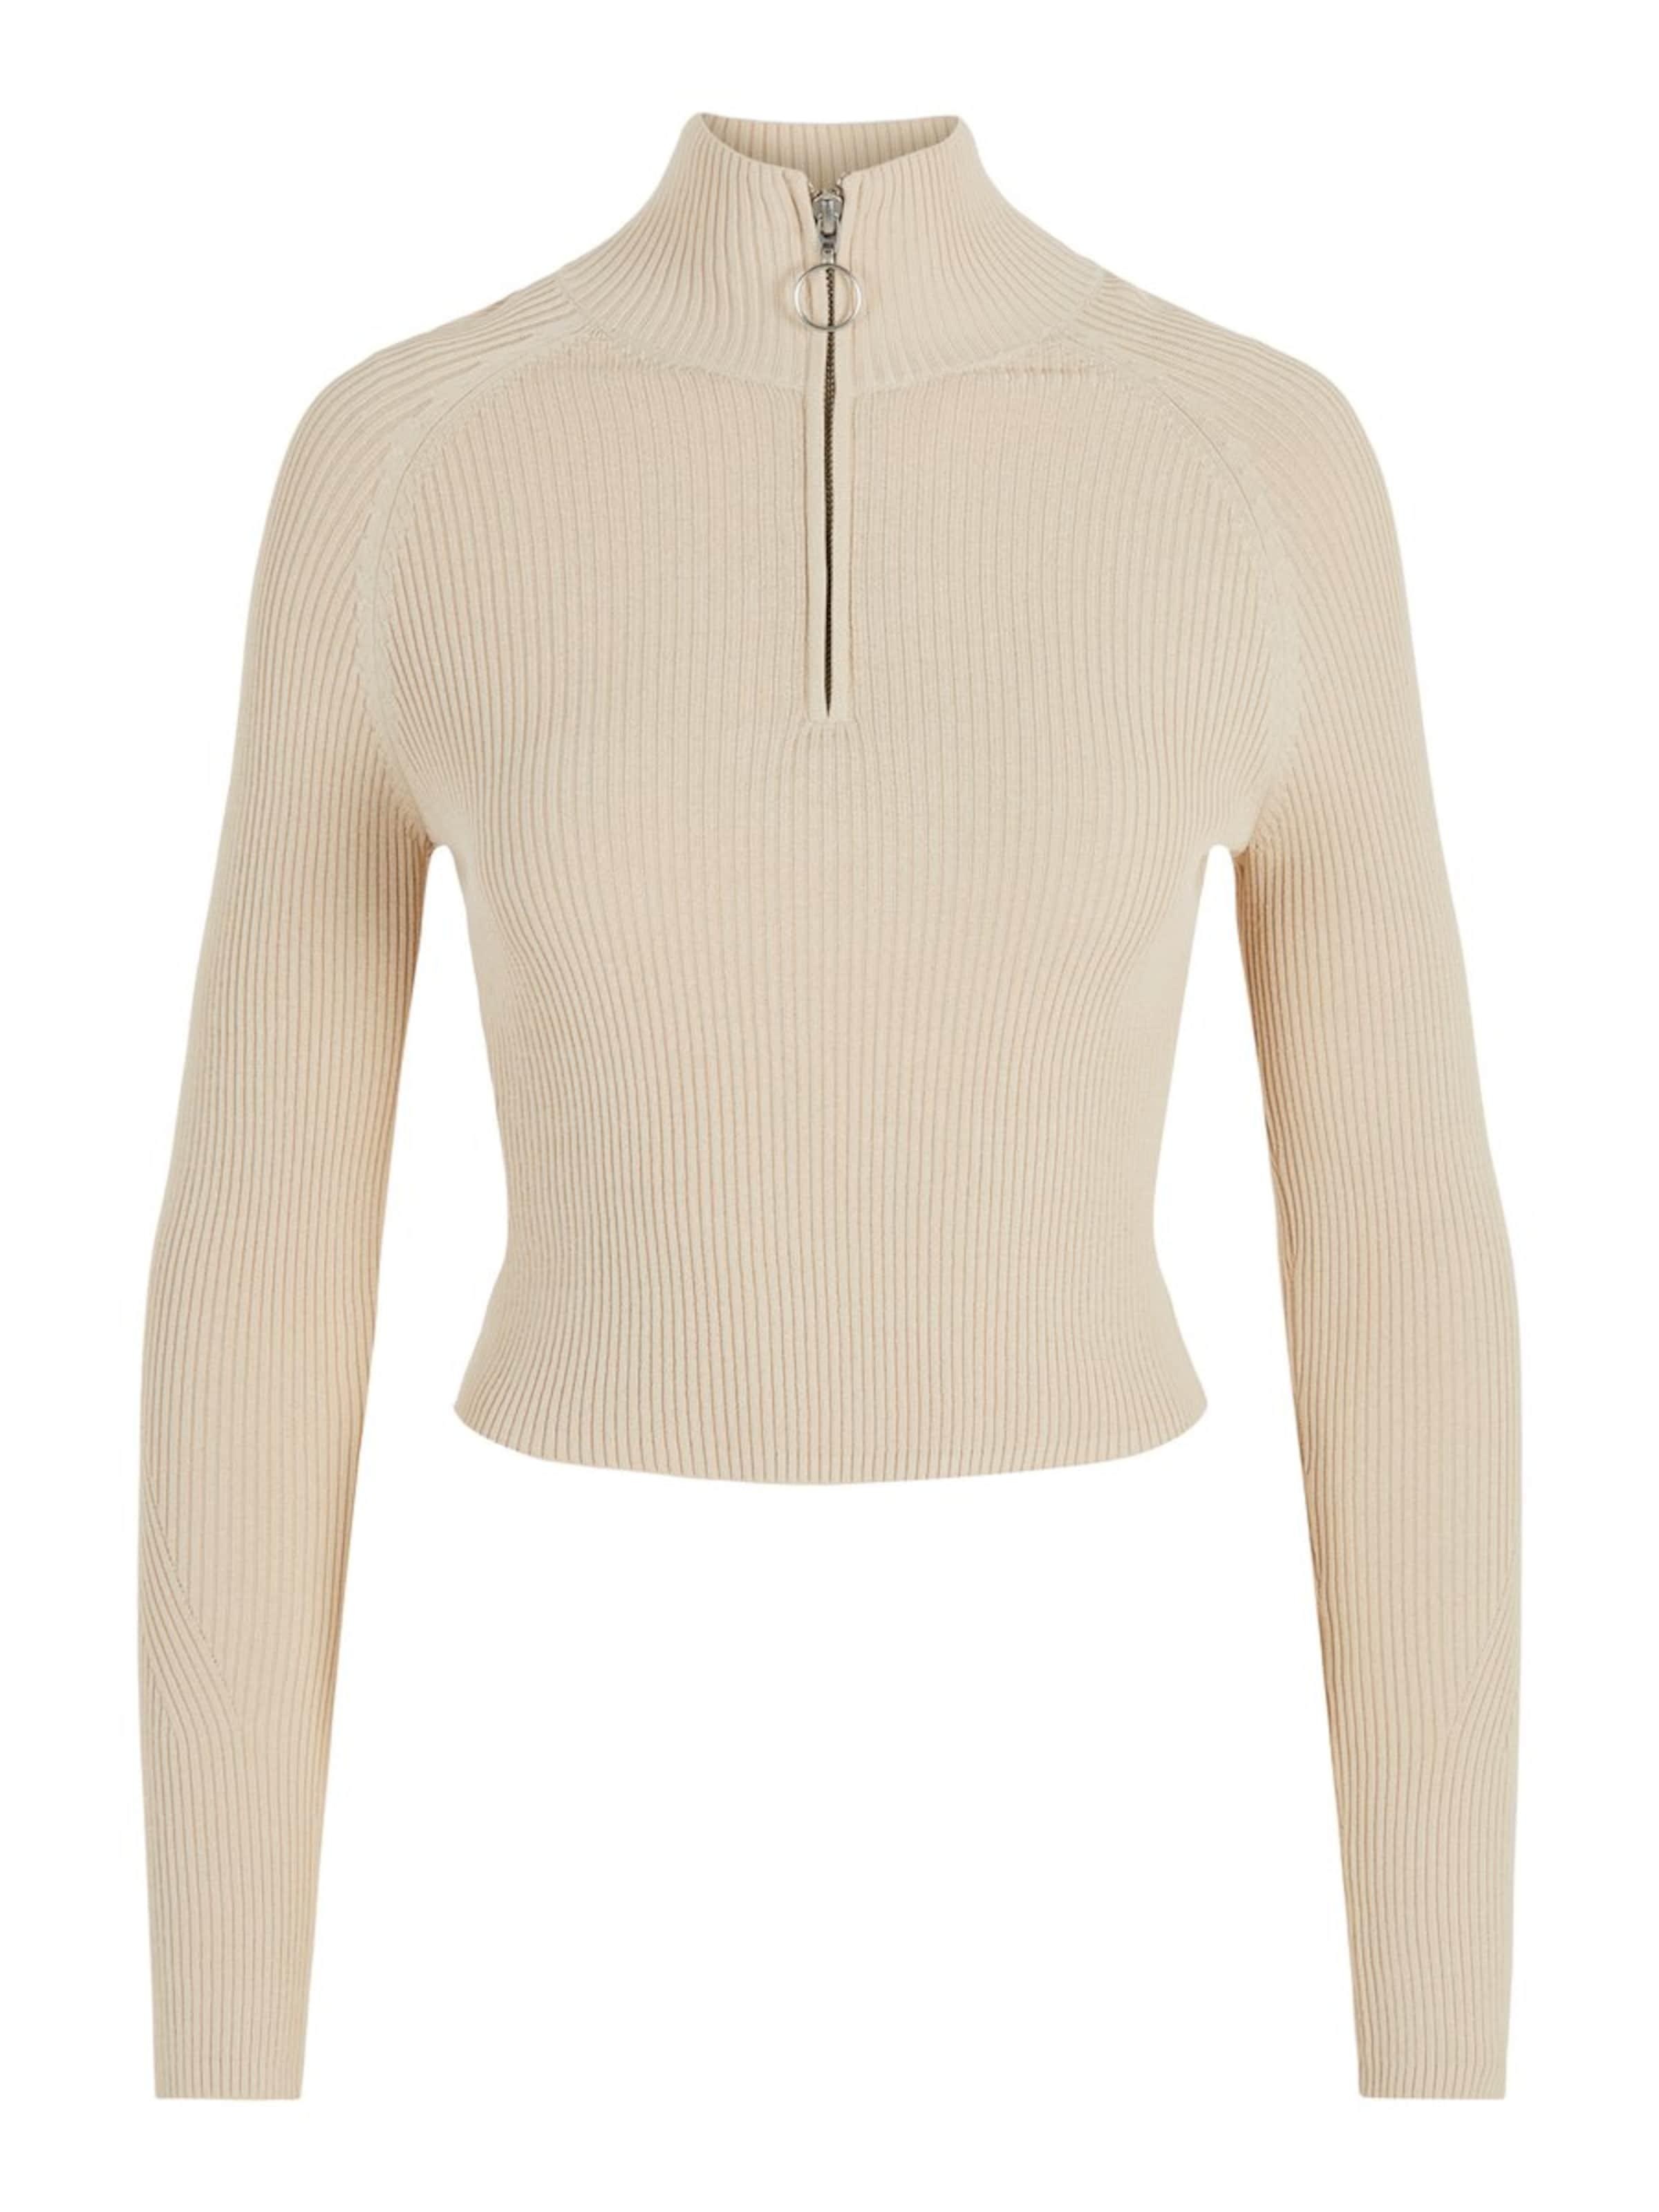 Pullover Pullover Pullover In lindeberg J J lindeberg In lindeberg J Beige Beige IDE29H